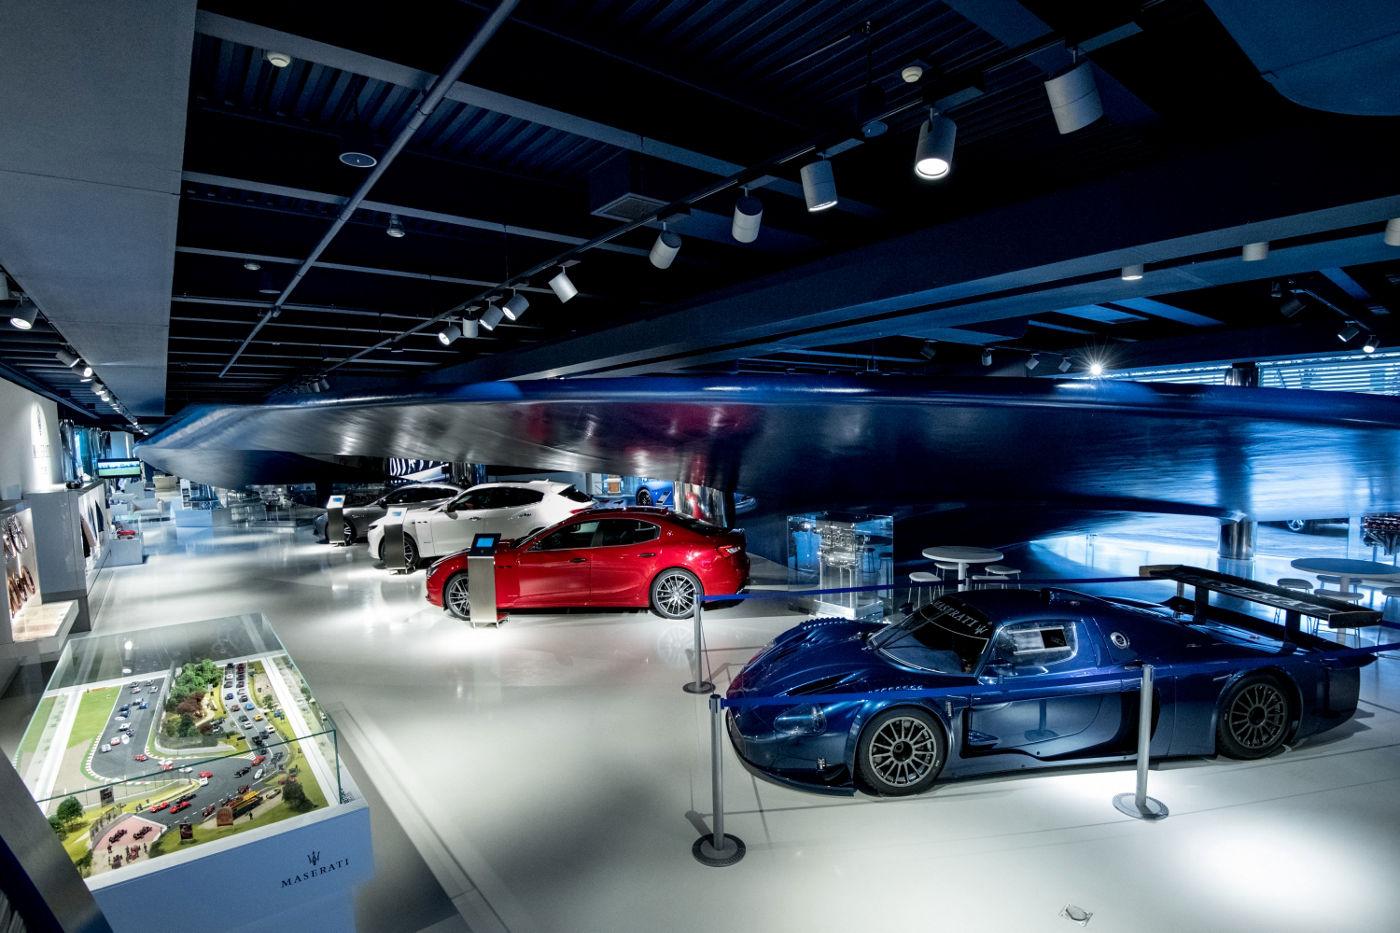 Maserati Showroom in Modena